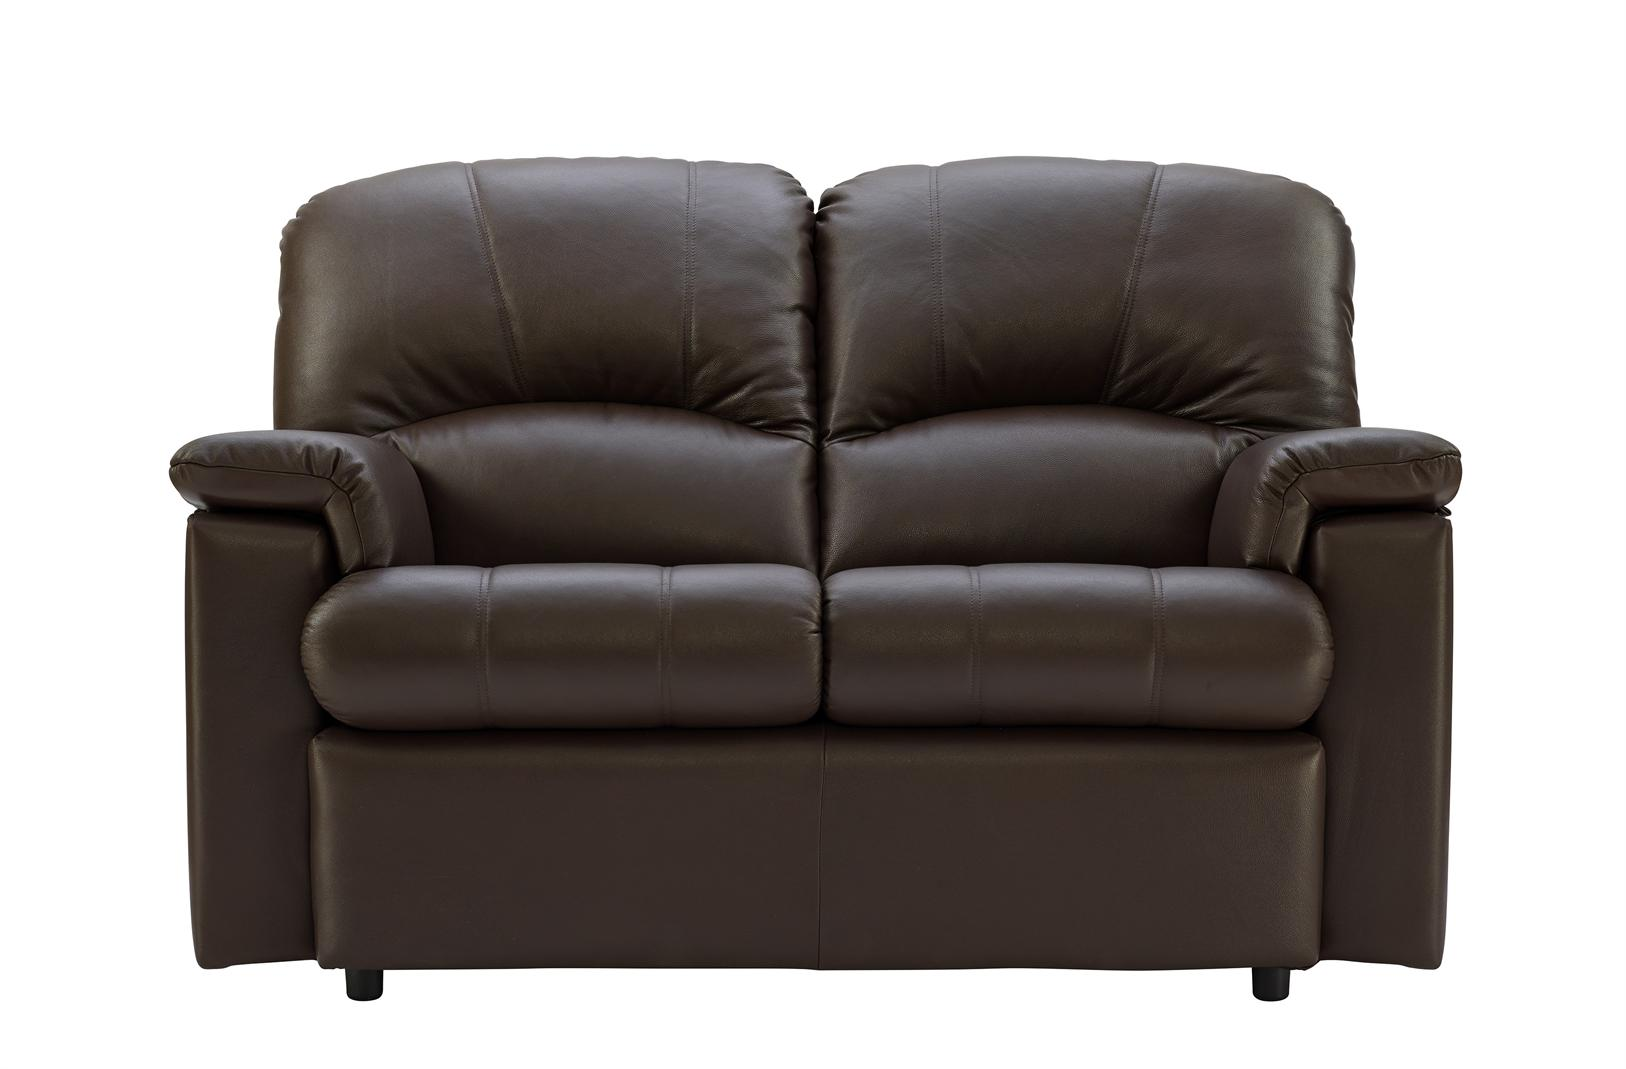 G Plan - Chloe Two Seater Sofa